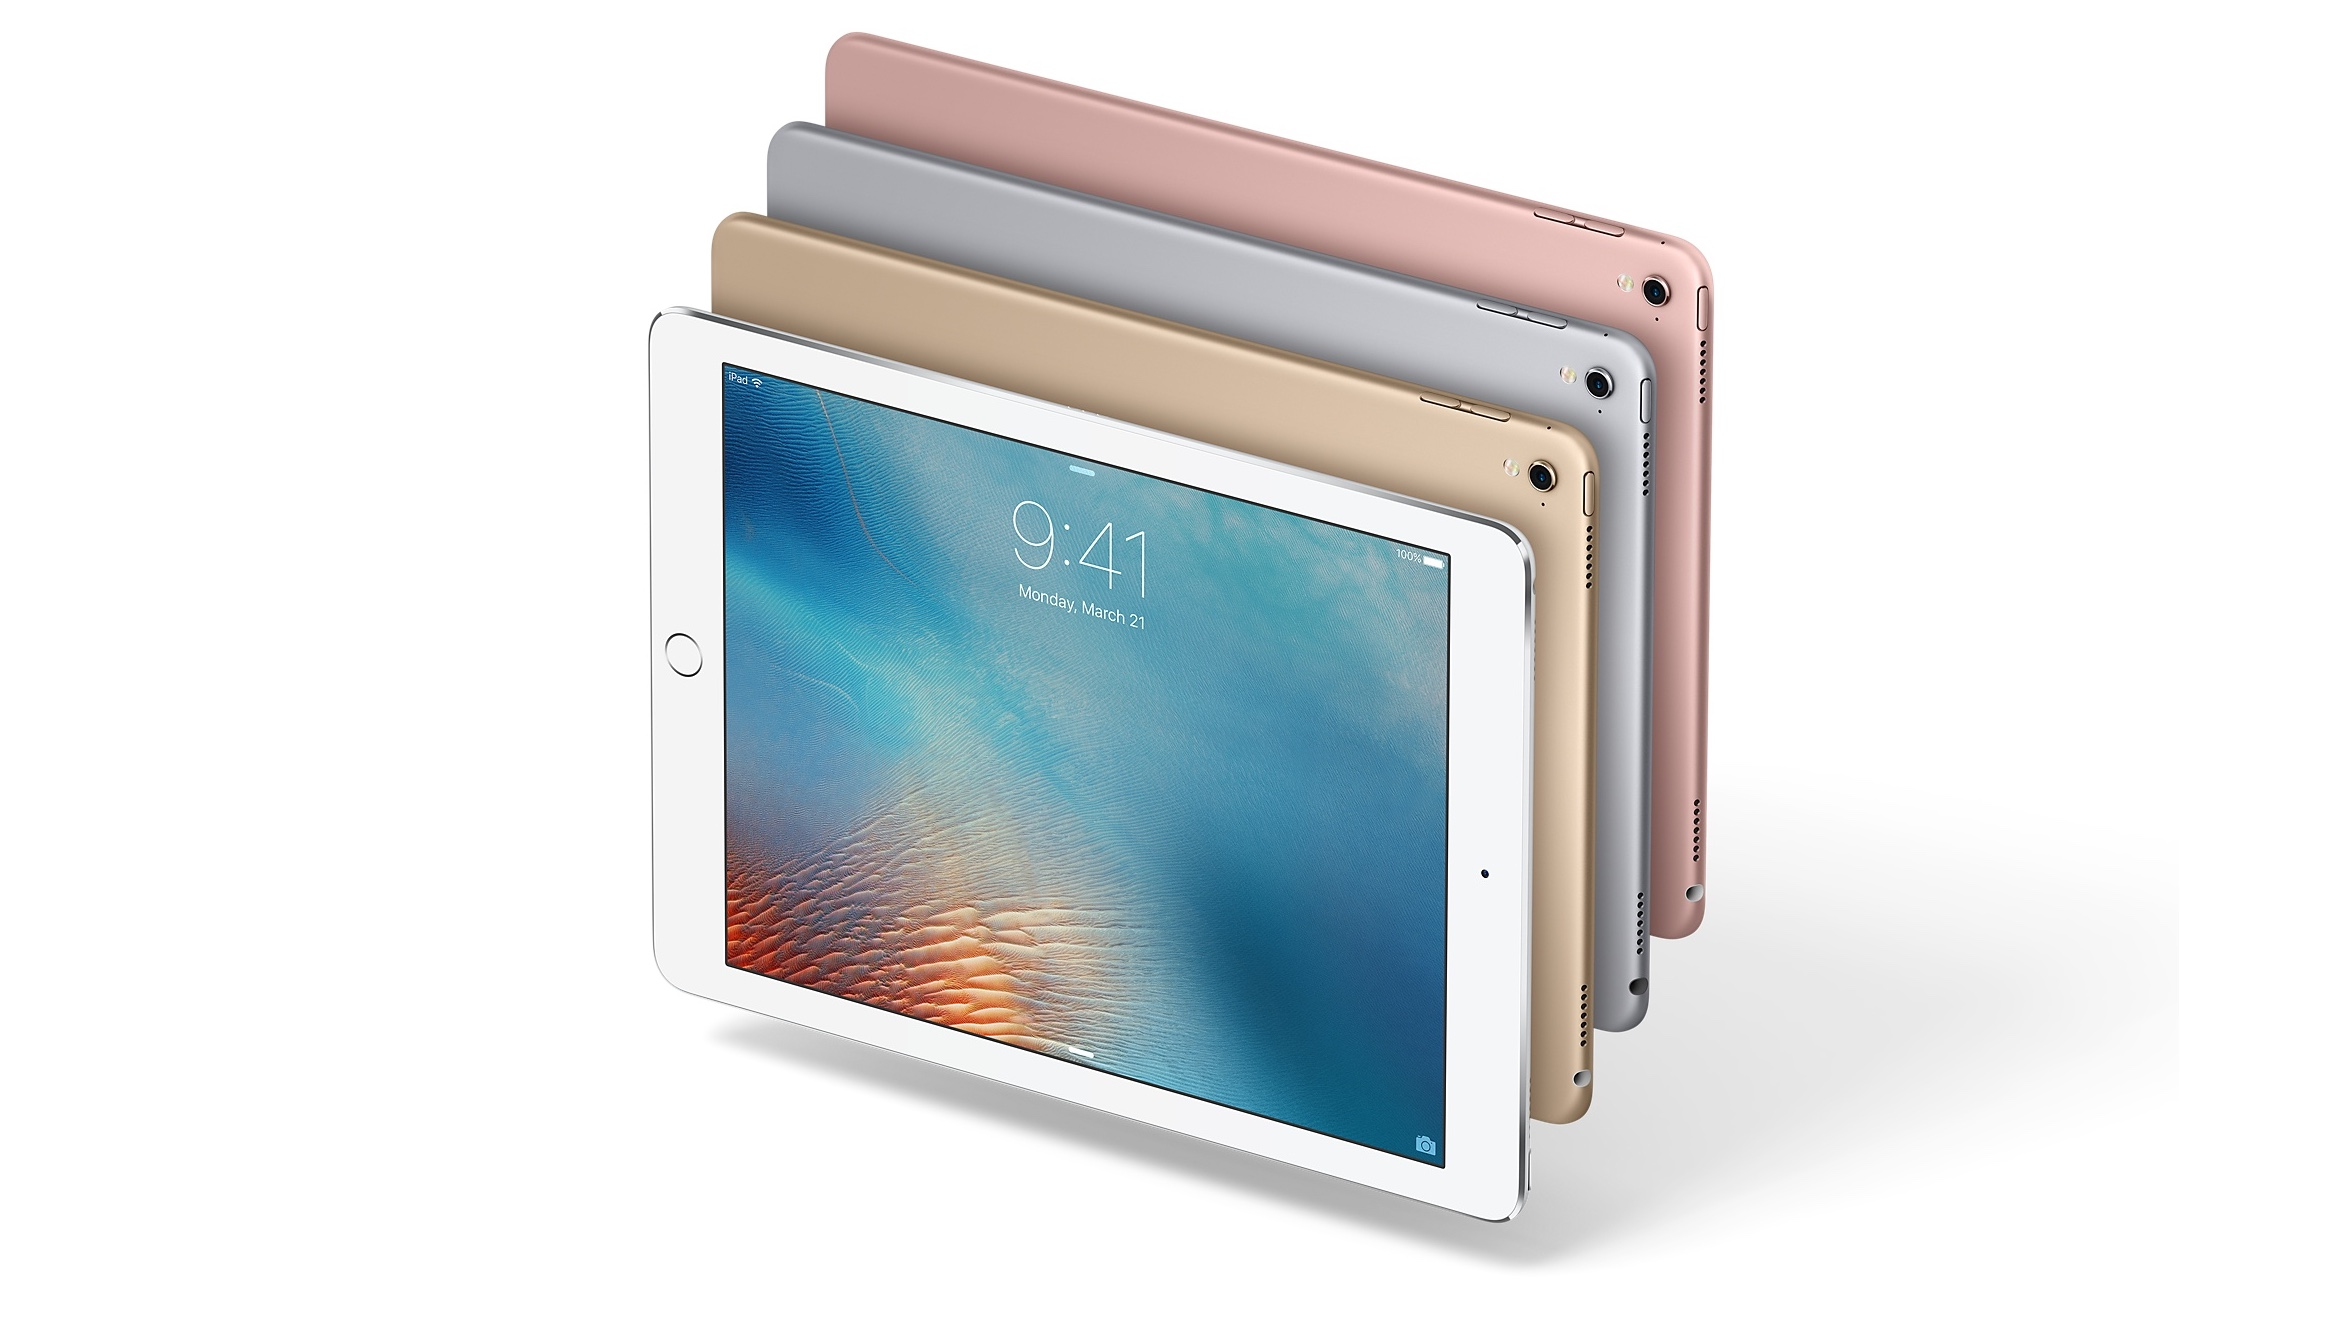 apple 9 inch ipad pro all colors